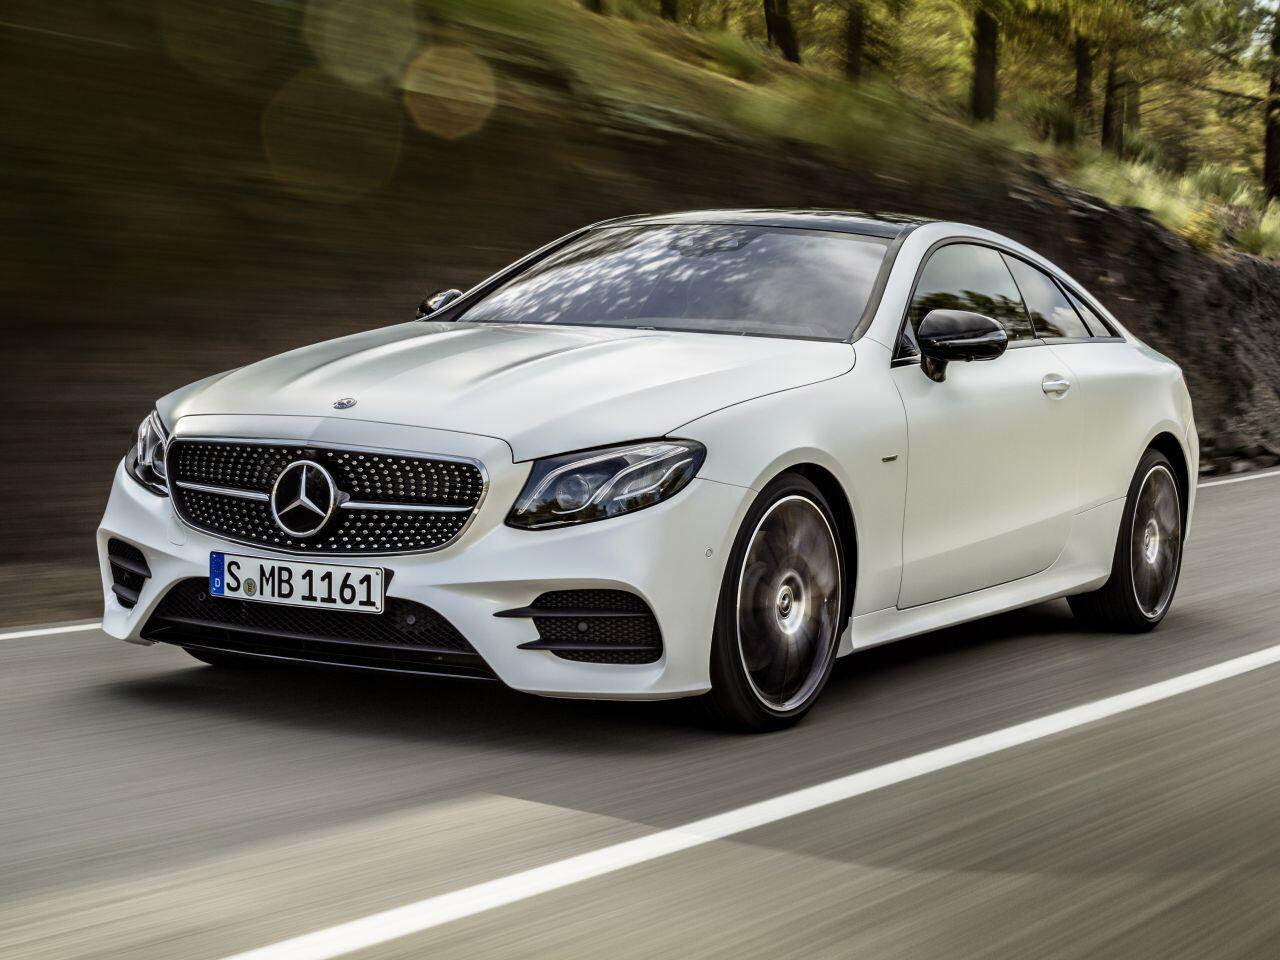 Bild zu Platz 1: Mercedes-Benz E-Klasse Coupé